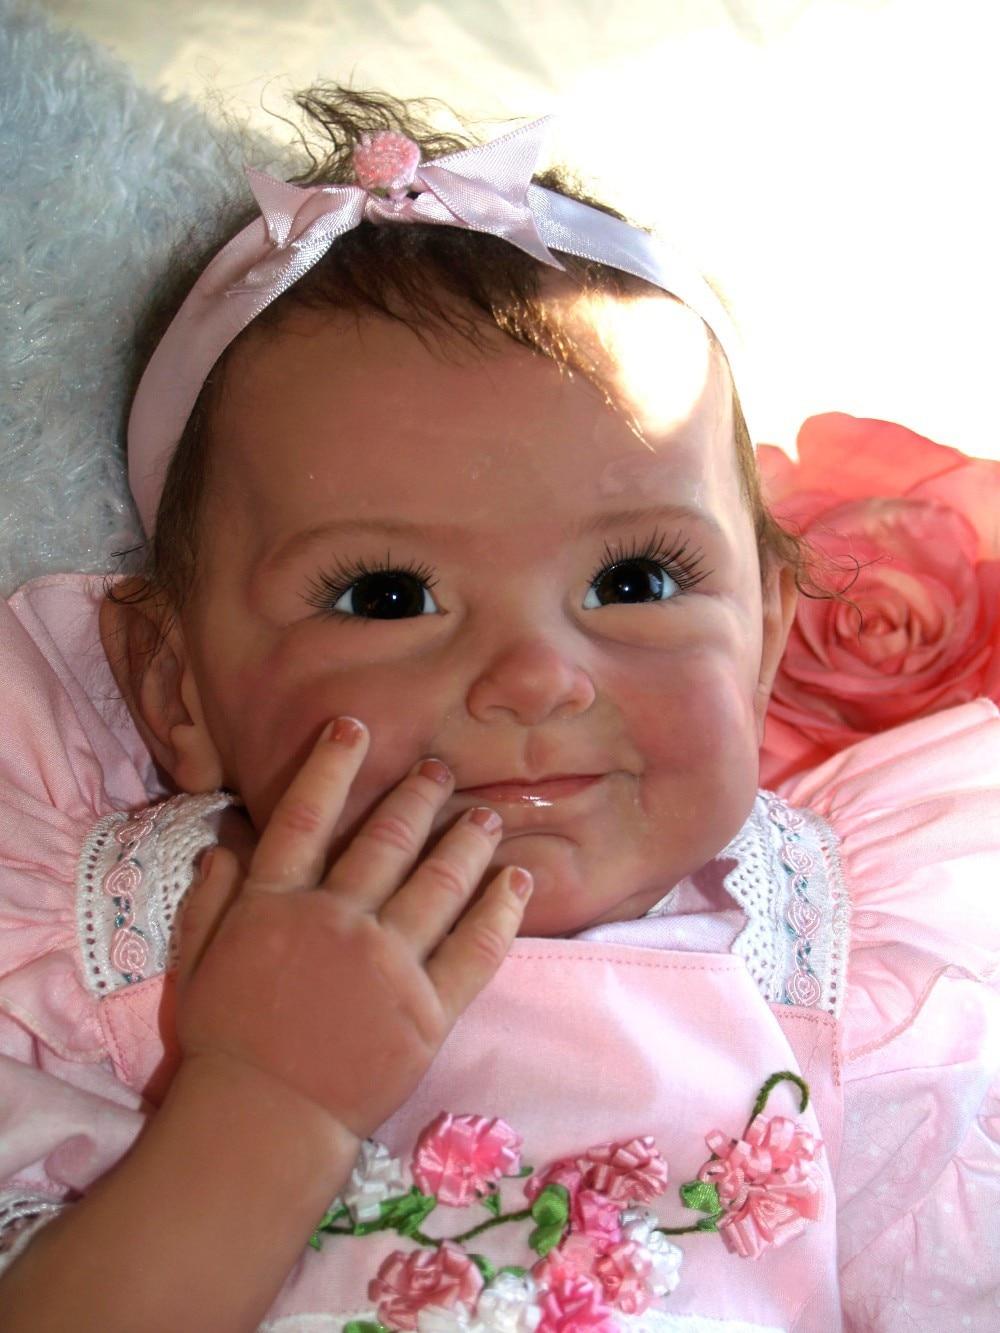 55cm Soft Body Silicone Reborn Baby Dolls Toy Realistic Newborn Baby Doll Girl Brinquedos Newborn NPKCOLLECTION